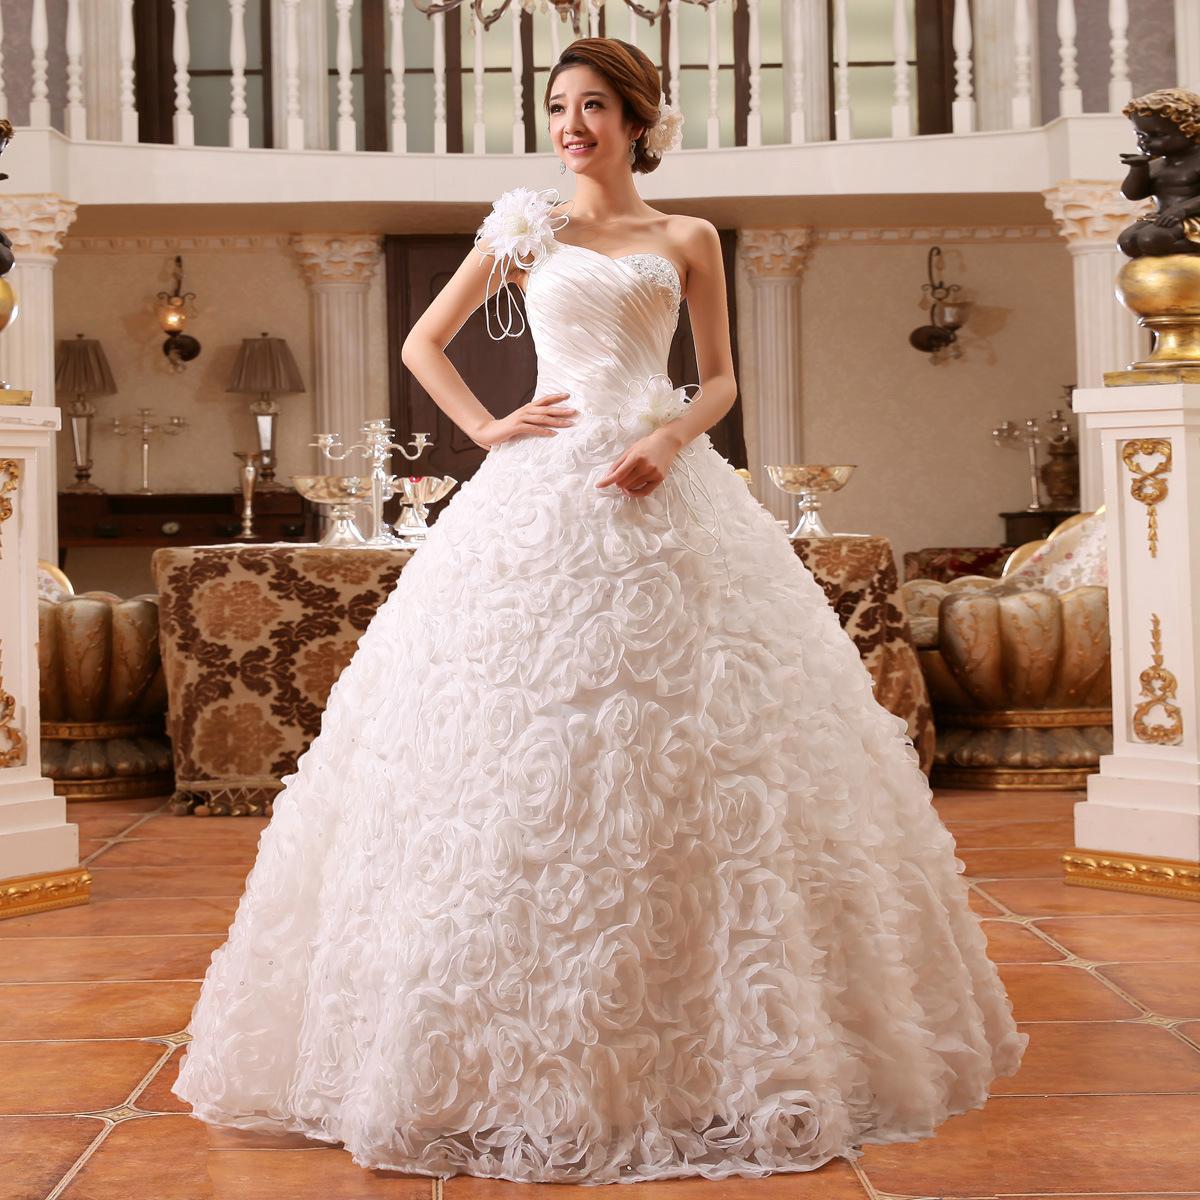 Cheap Wedding Dresses For Sale: Cheap One Shoulder Flower Wedding Dresses 2018 Vestidos